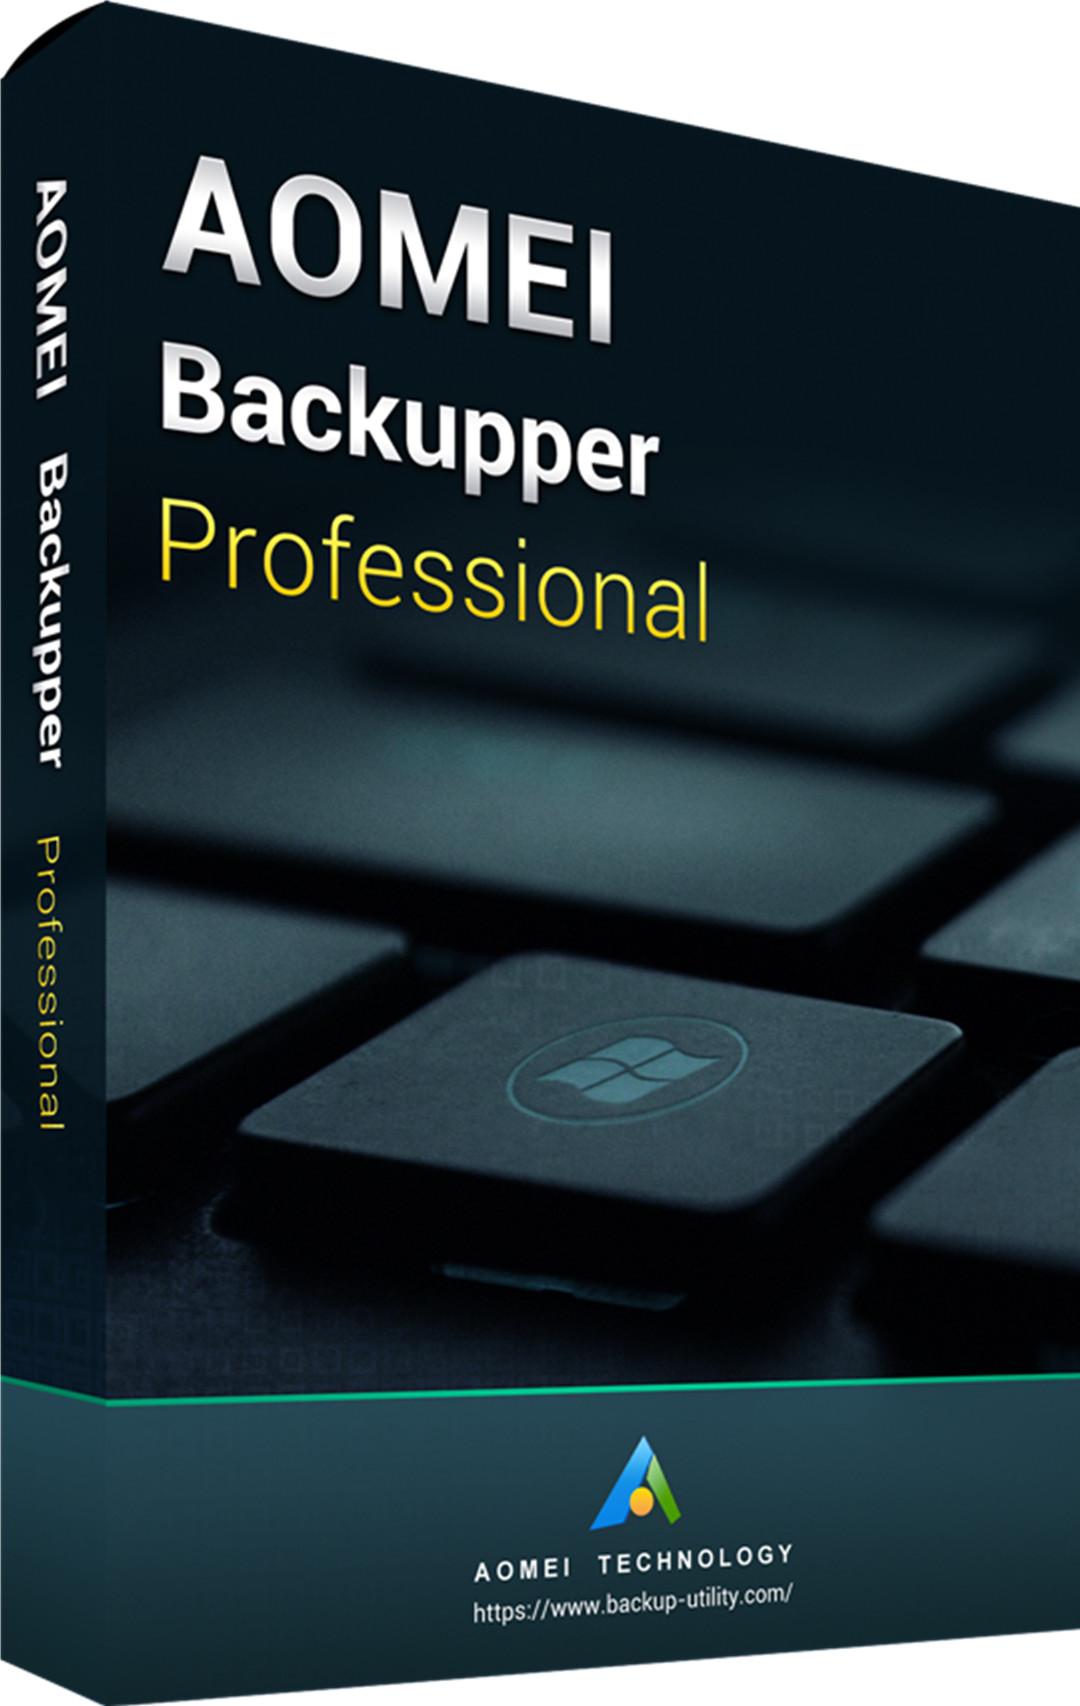 AOMEI Backupper Professional 365 Days 5.7 Edition Key Global